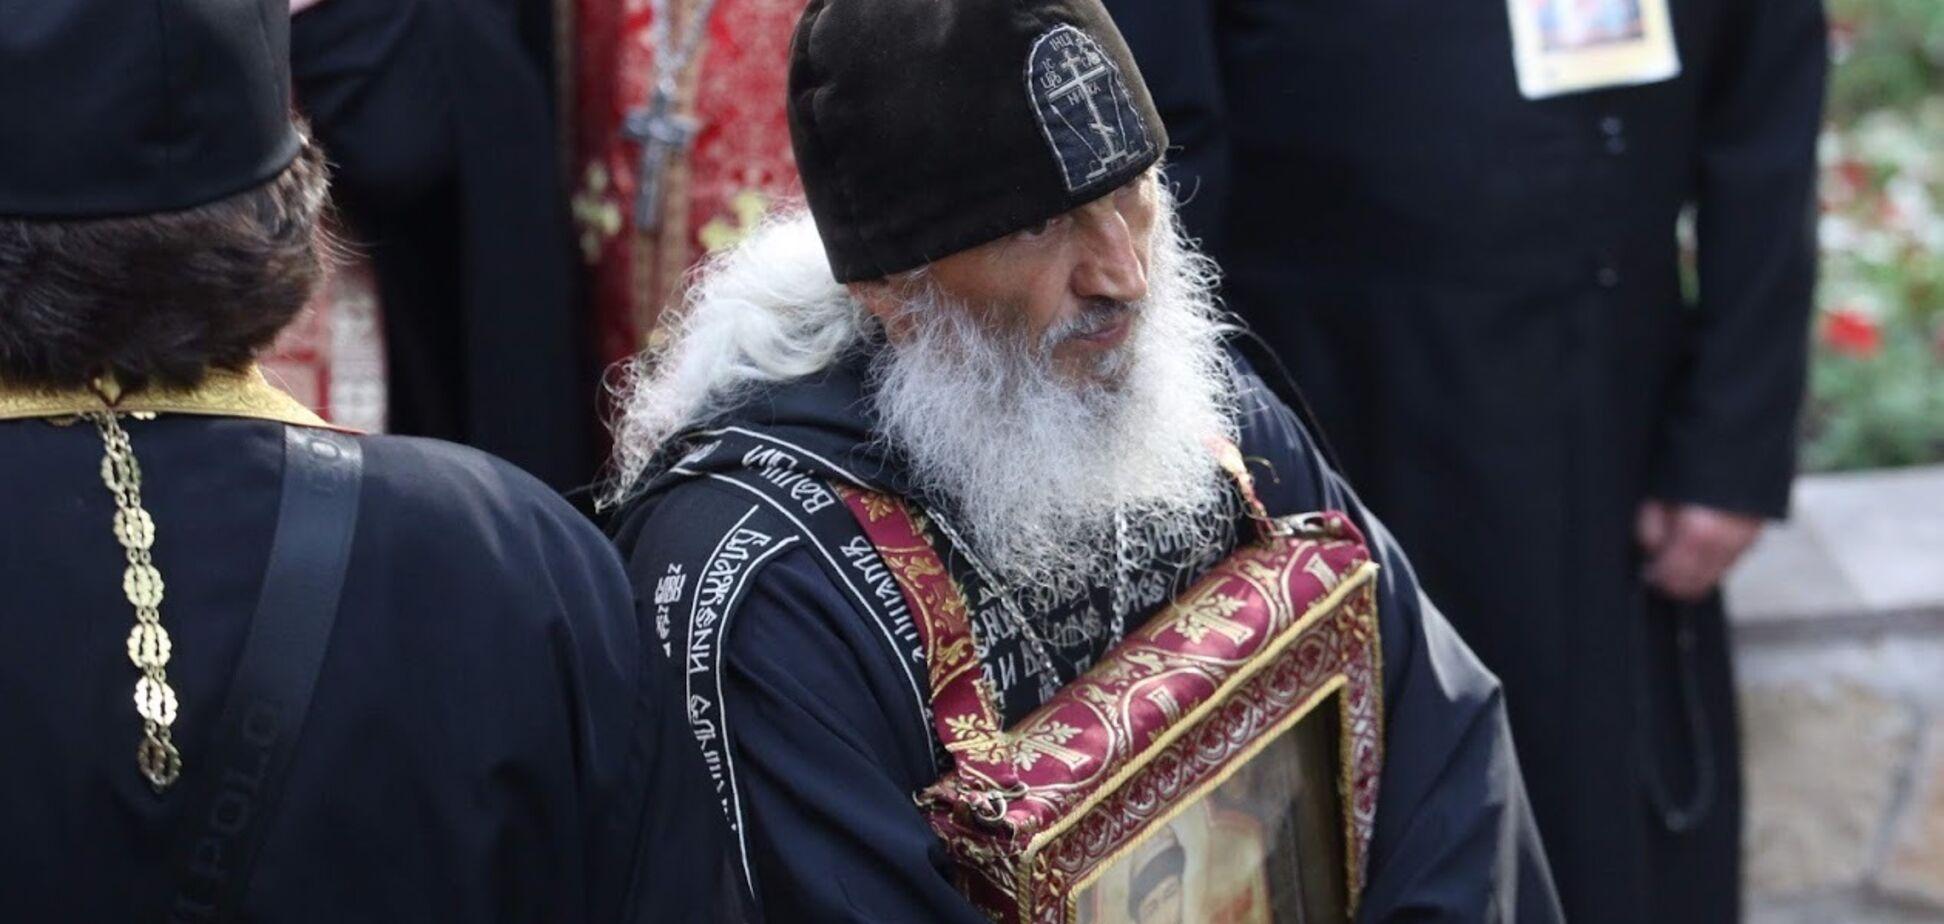 Схиигумен Сергий (Романов), который захватил монастирь